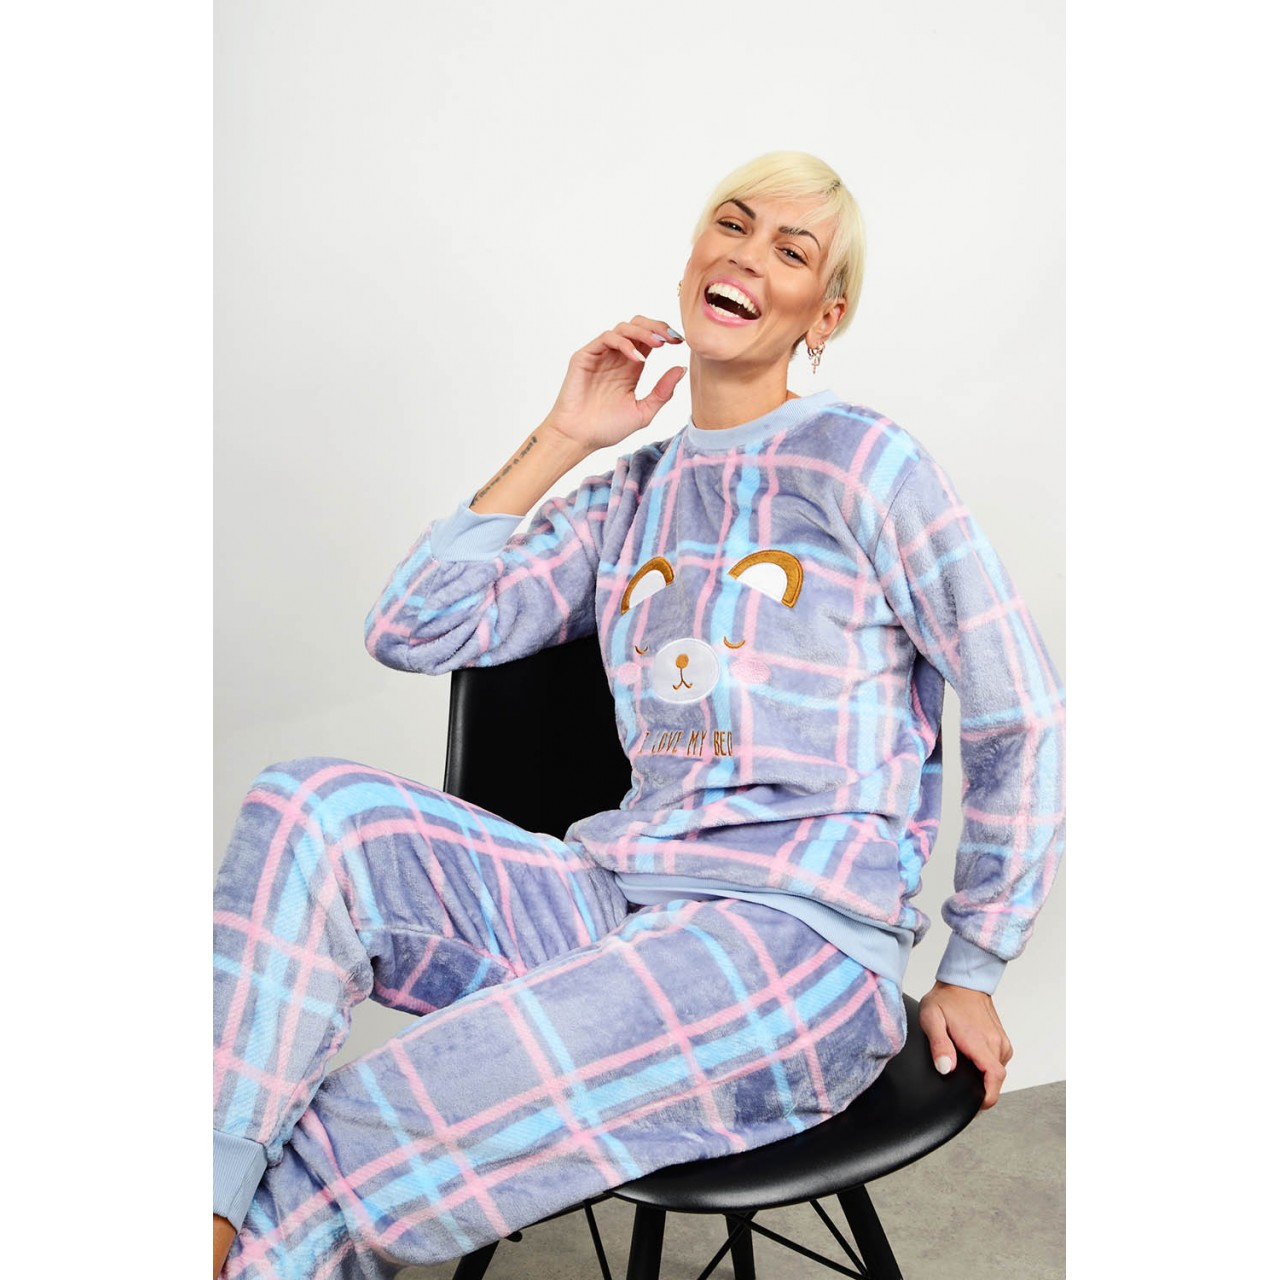 Set pyjamas with checkered pattern